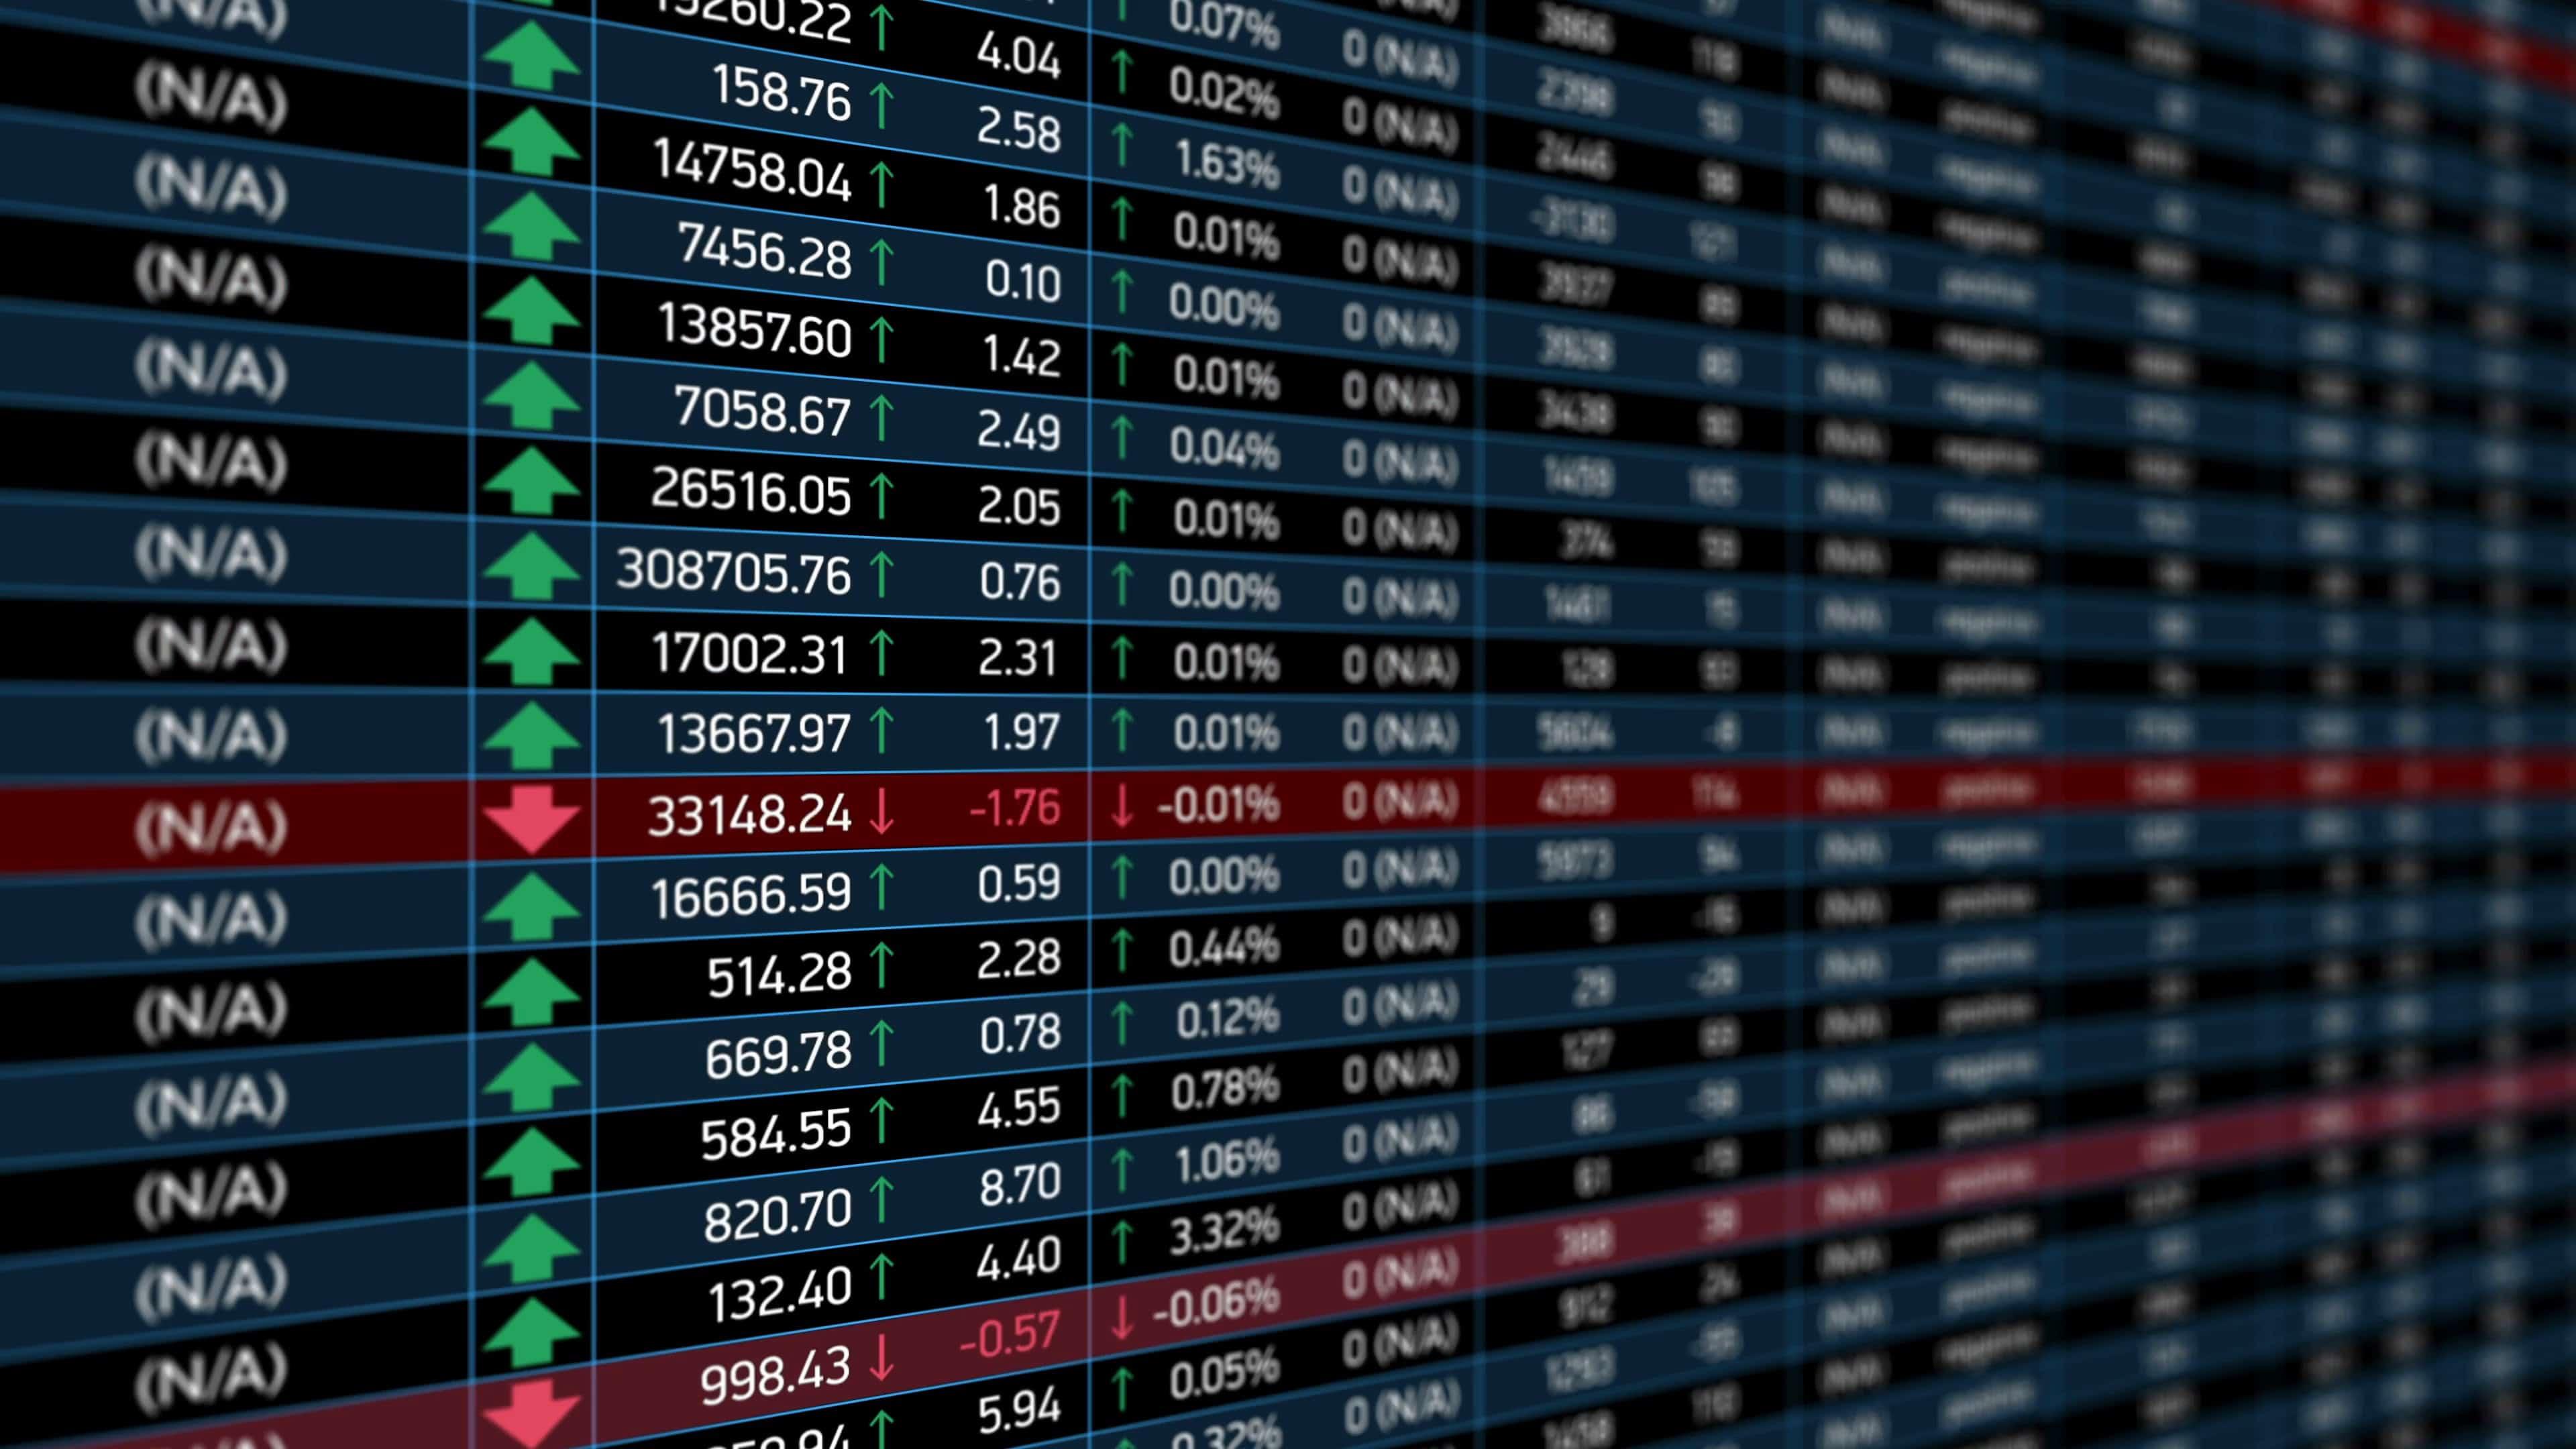 Stock Market Wallpaper Many HD Wallpaper